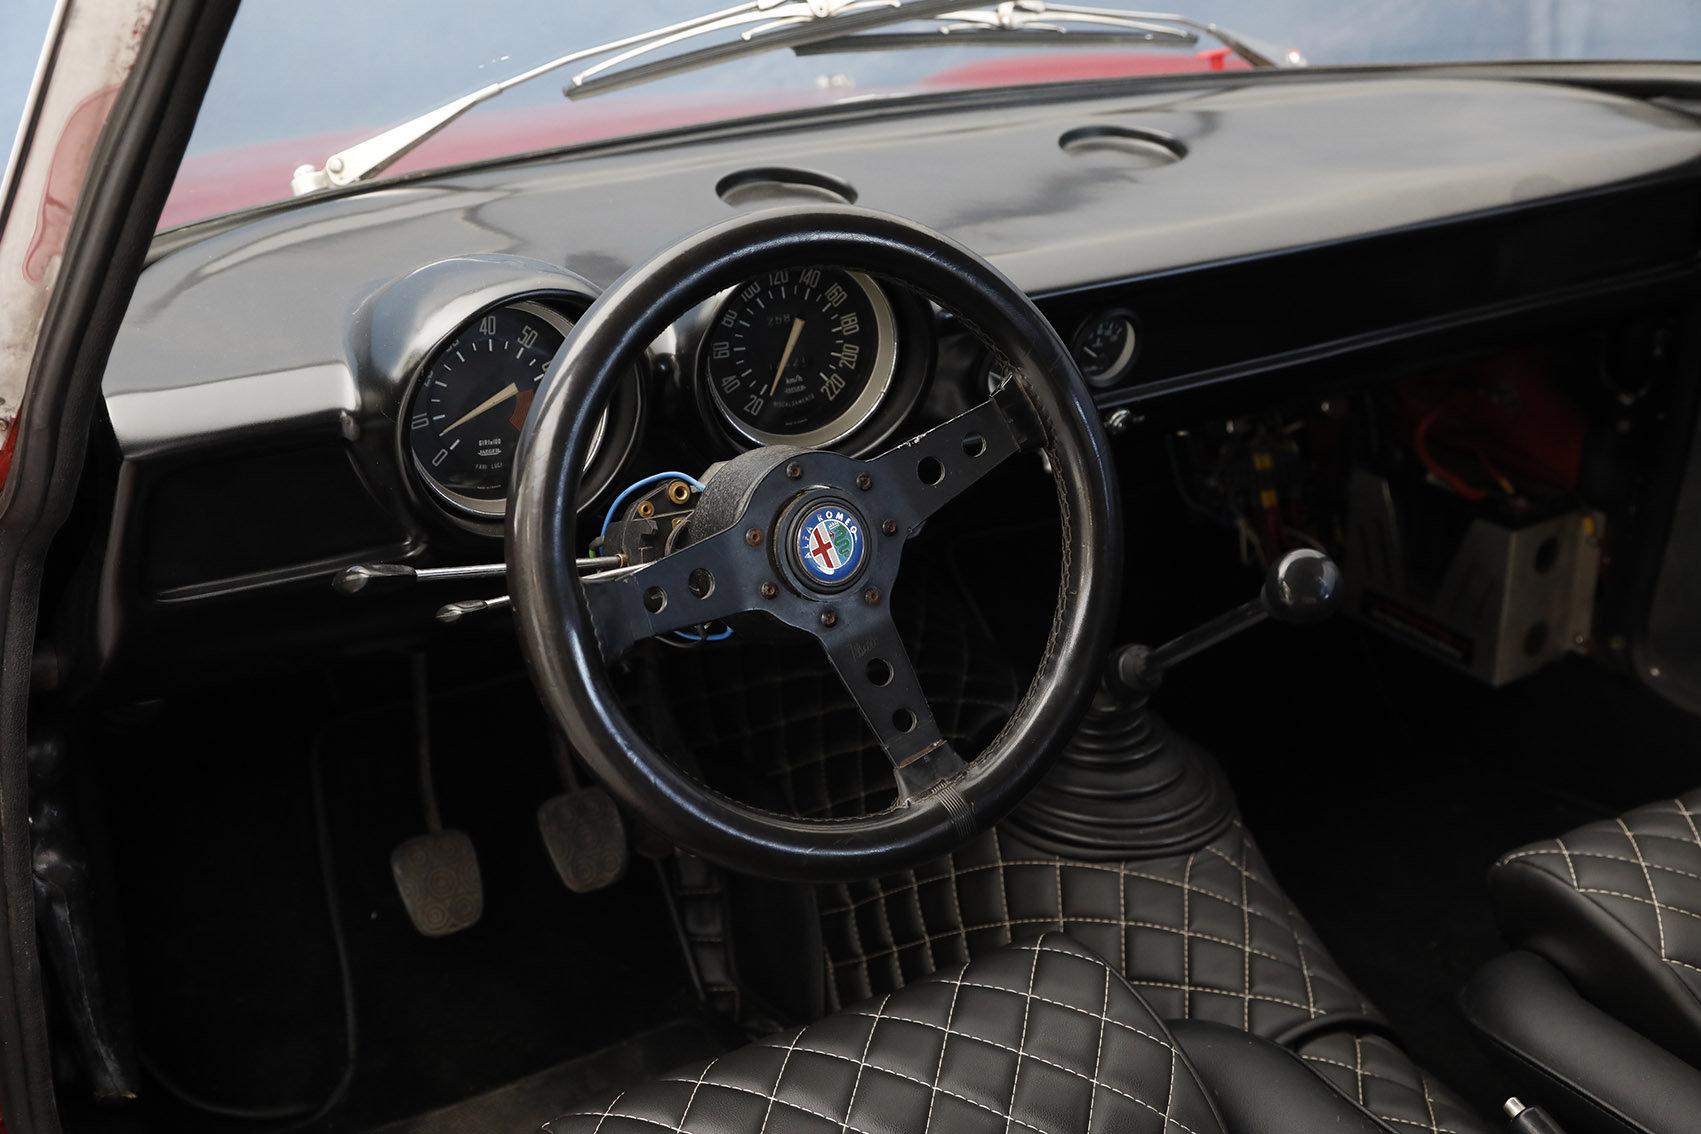 1967 Alfa Romeo 1600 GT Veloce  For Sale (picture 3 of 6)